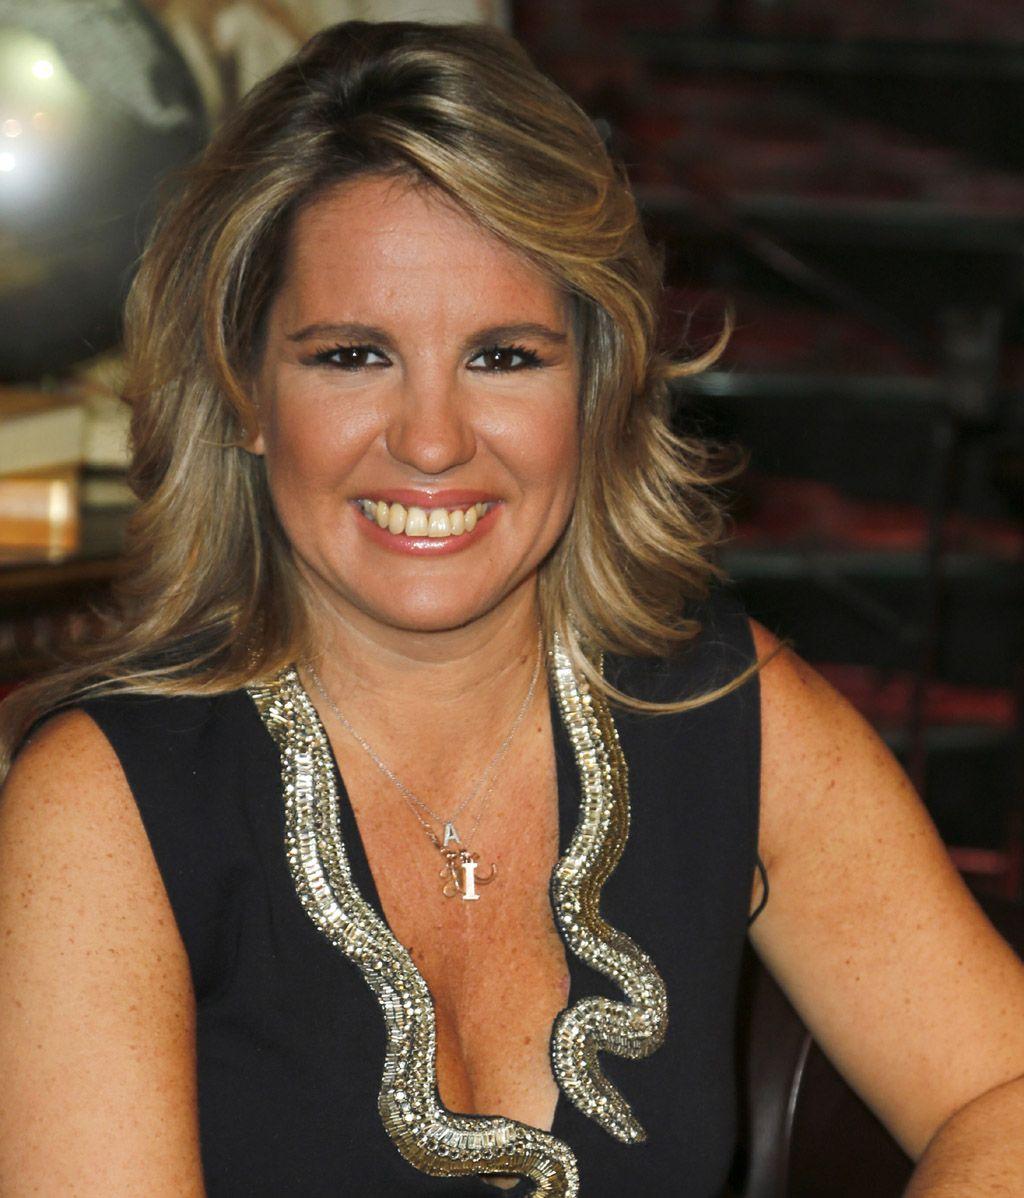 Carmen porter cuatro for Cuatro tv cuarto milenio